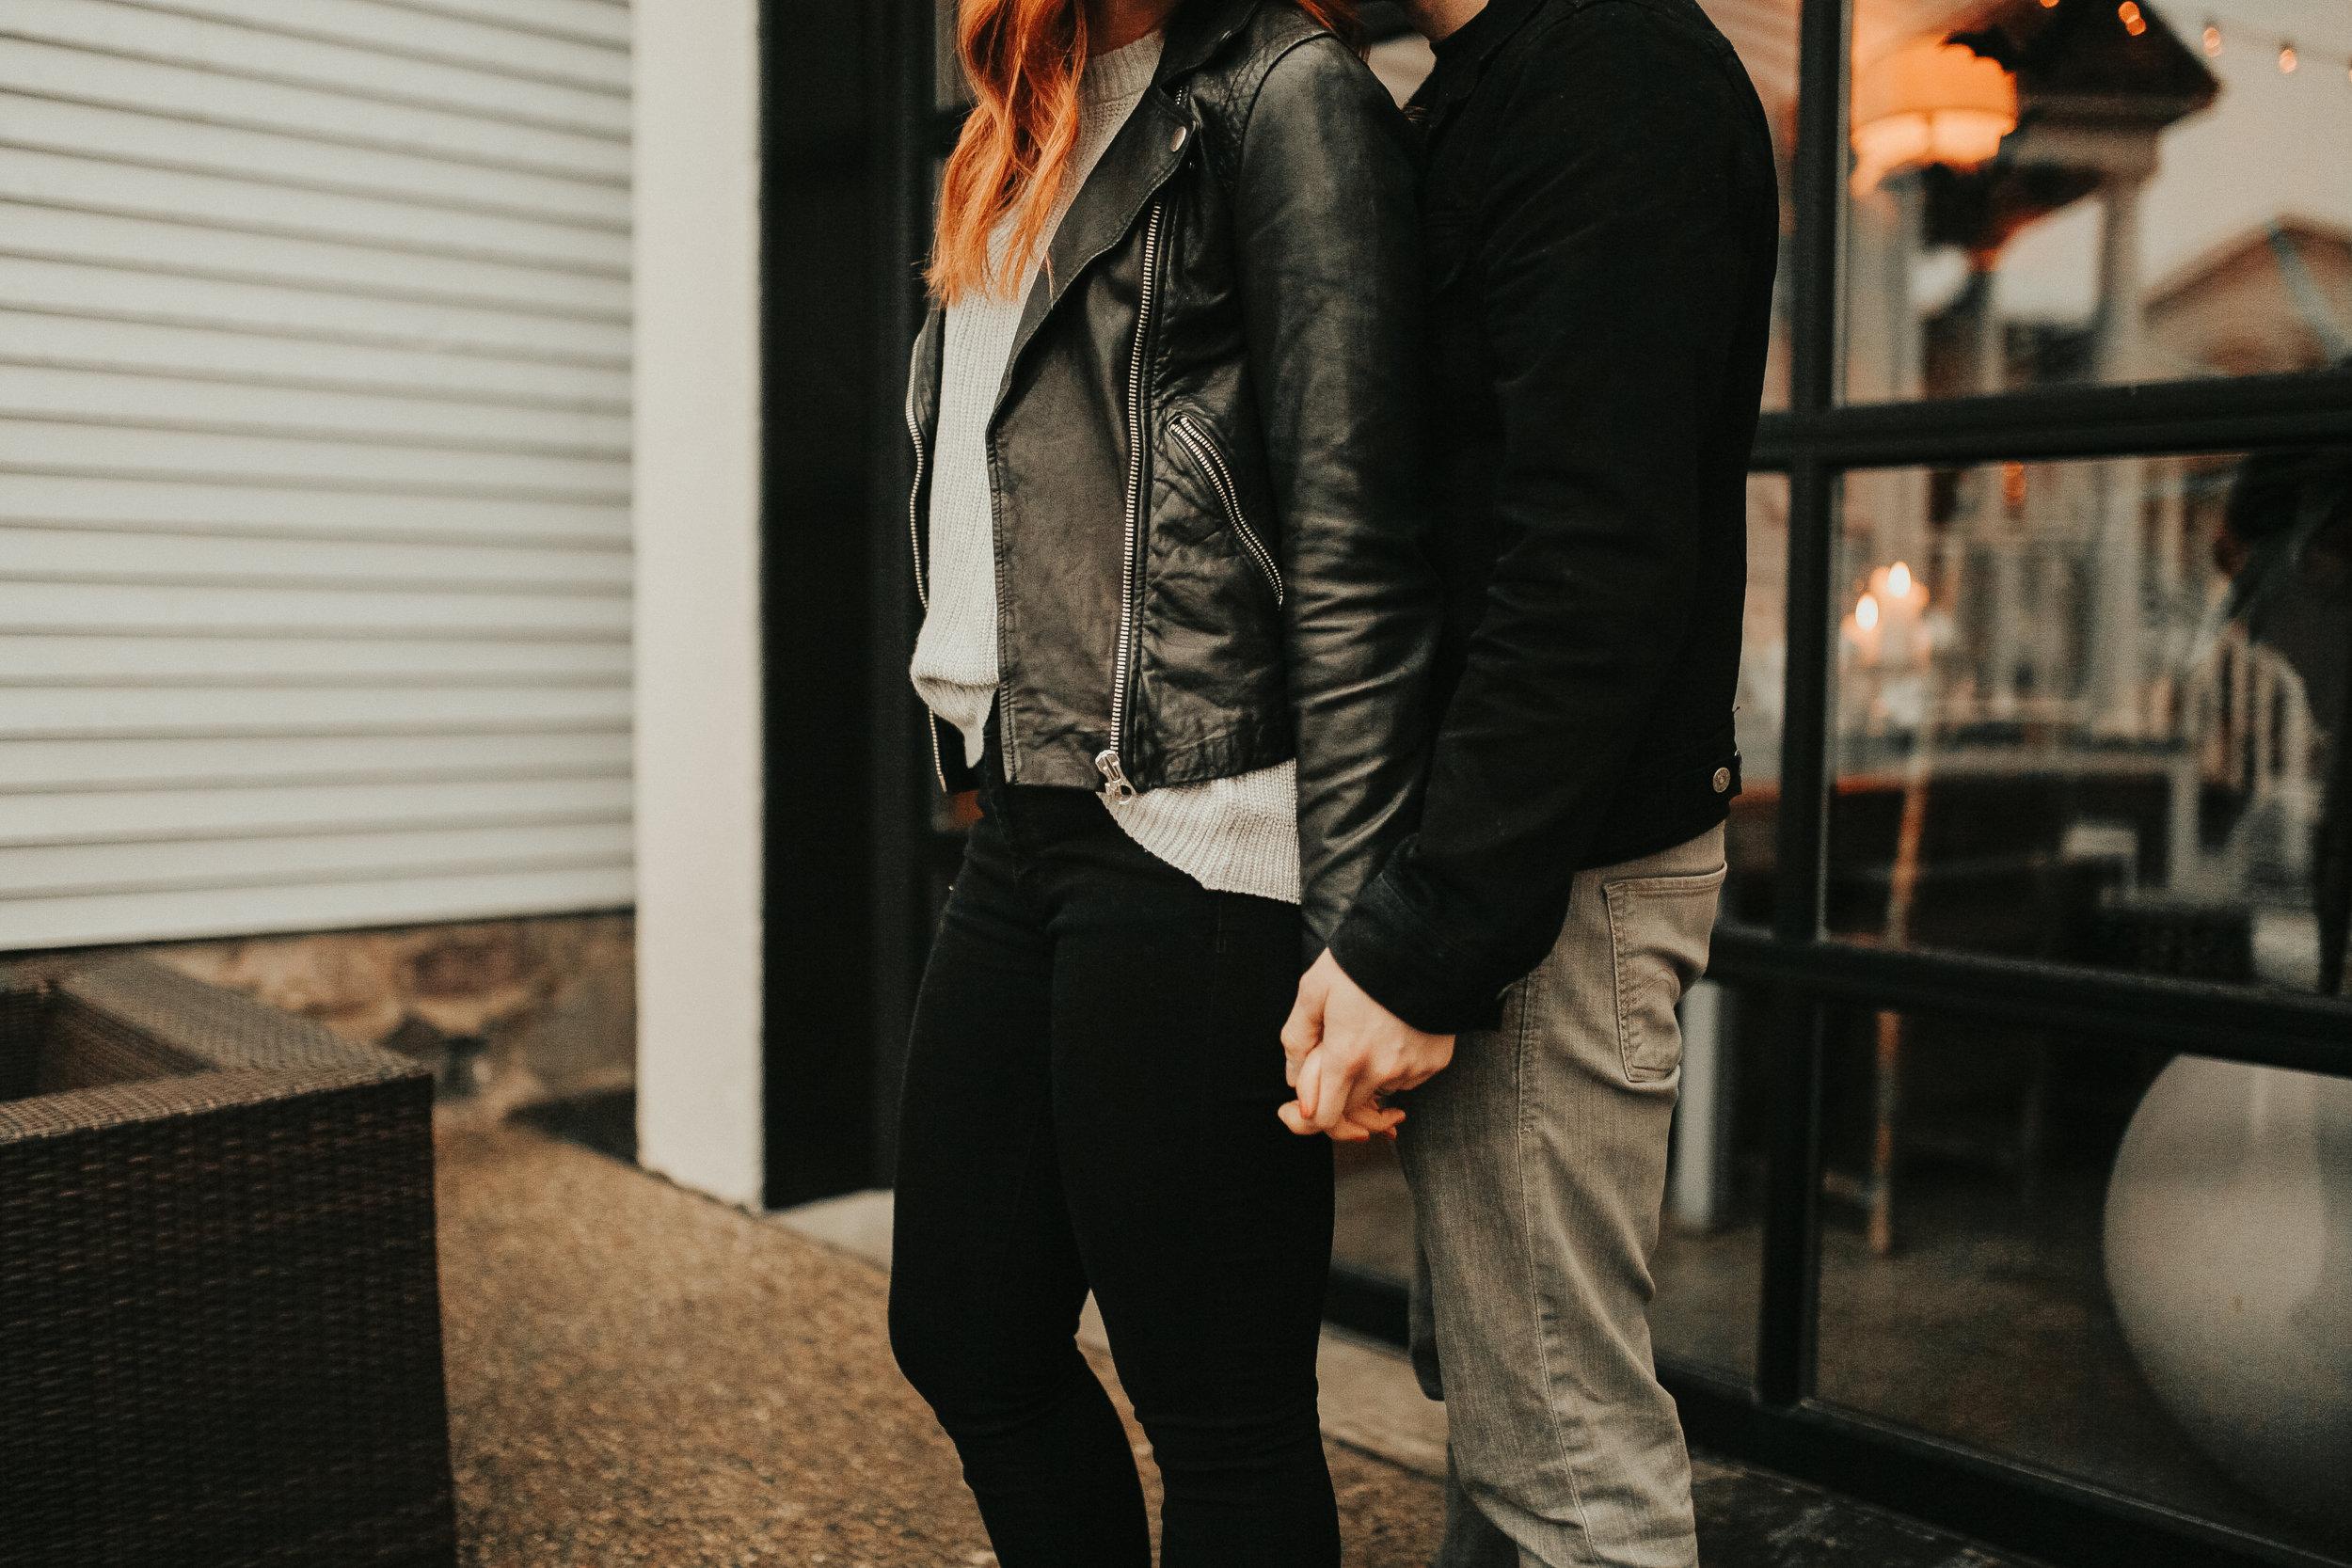 Megan+Drew_DateNight_117.jpg